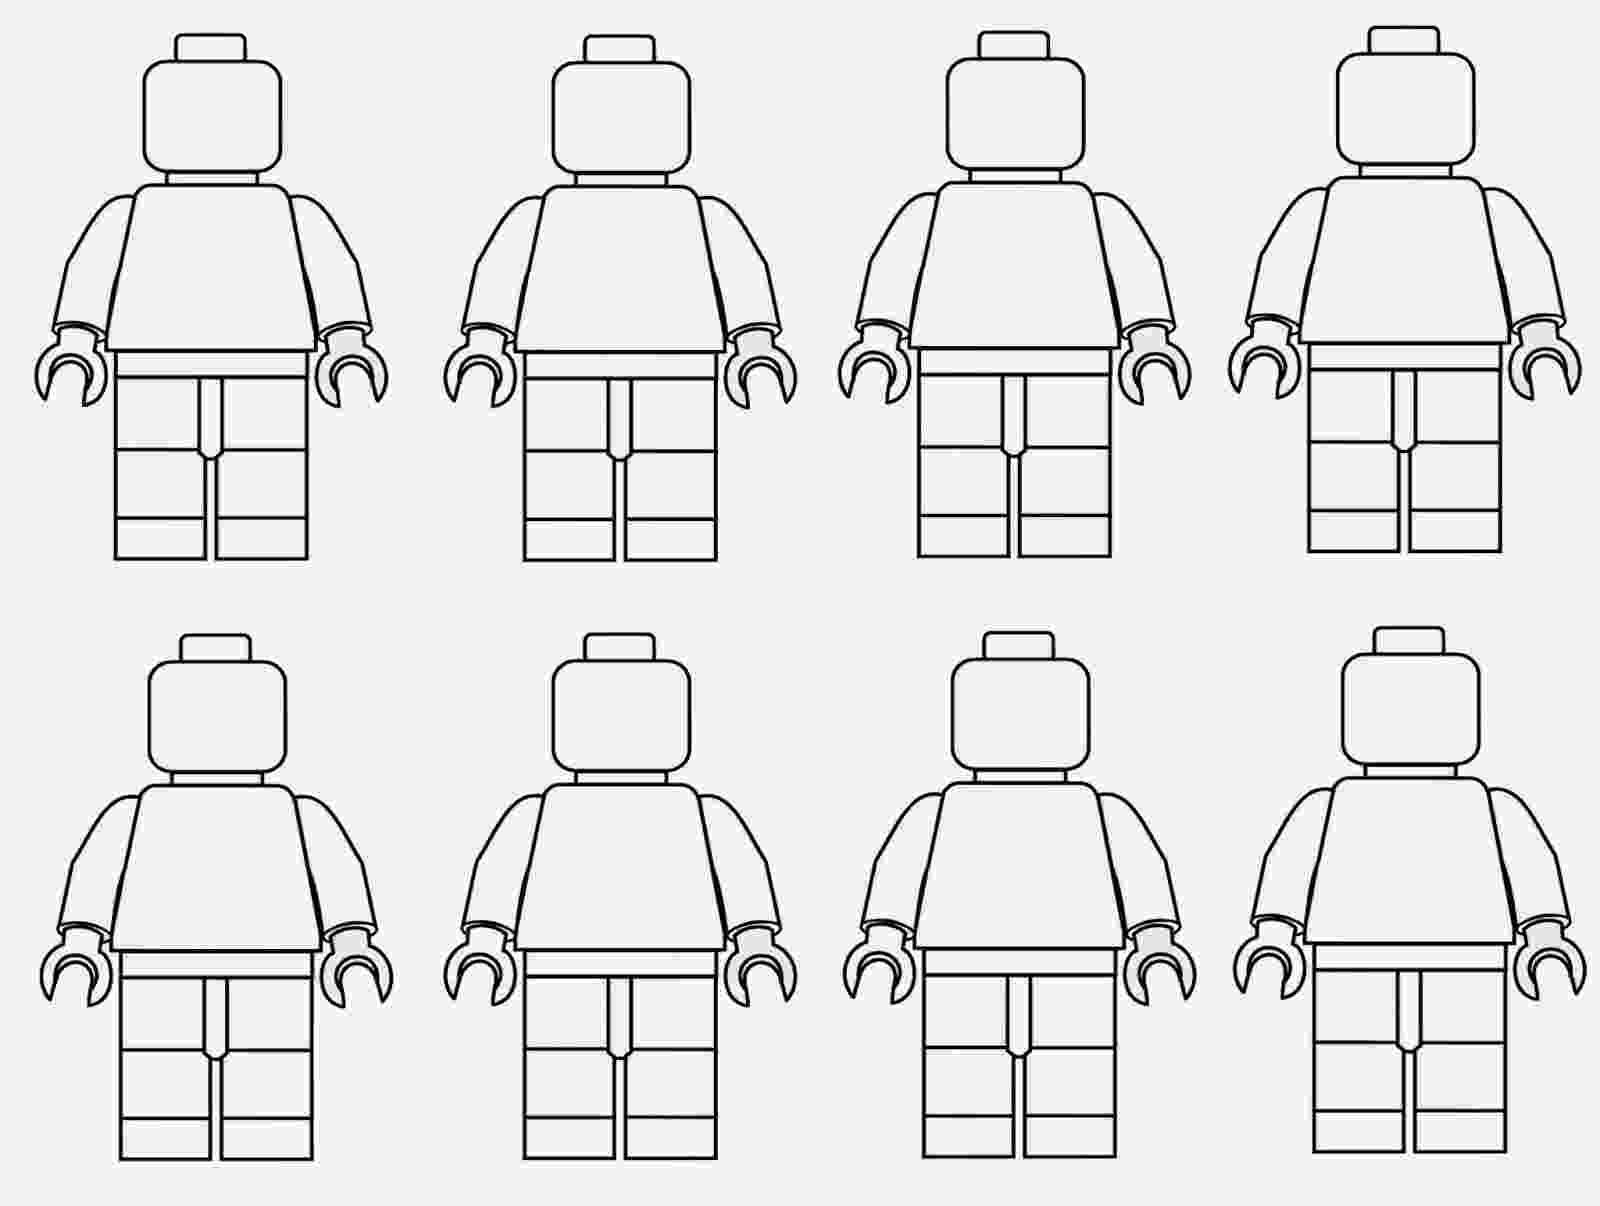 lego man printable lego iron man coloring page wecoloringpagecom man lego printable